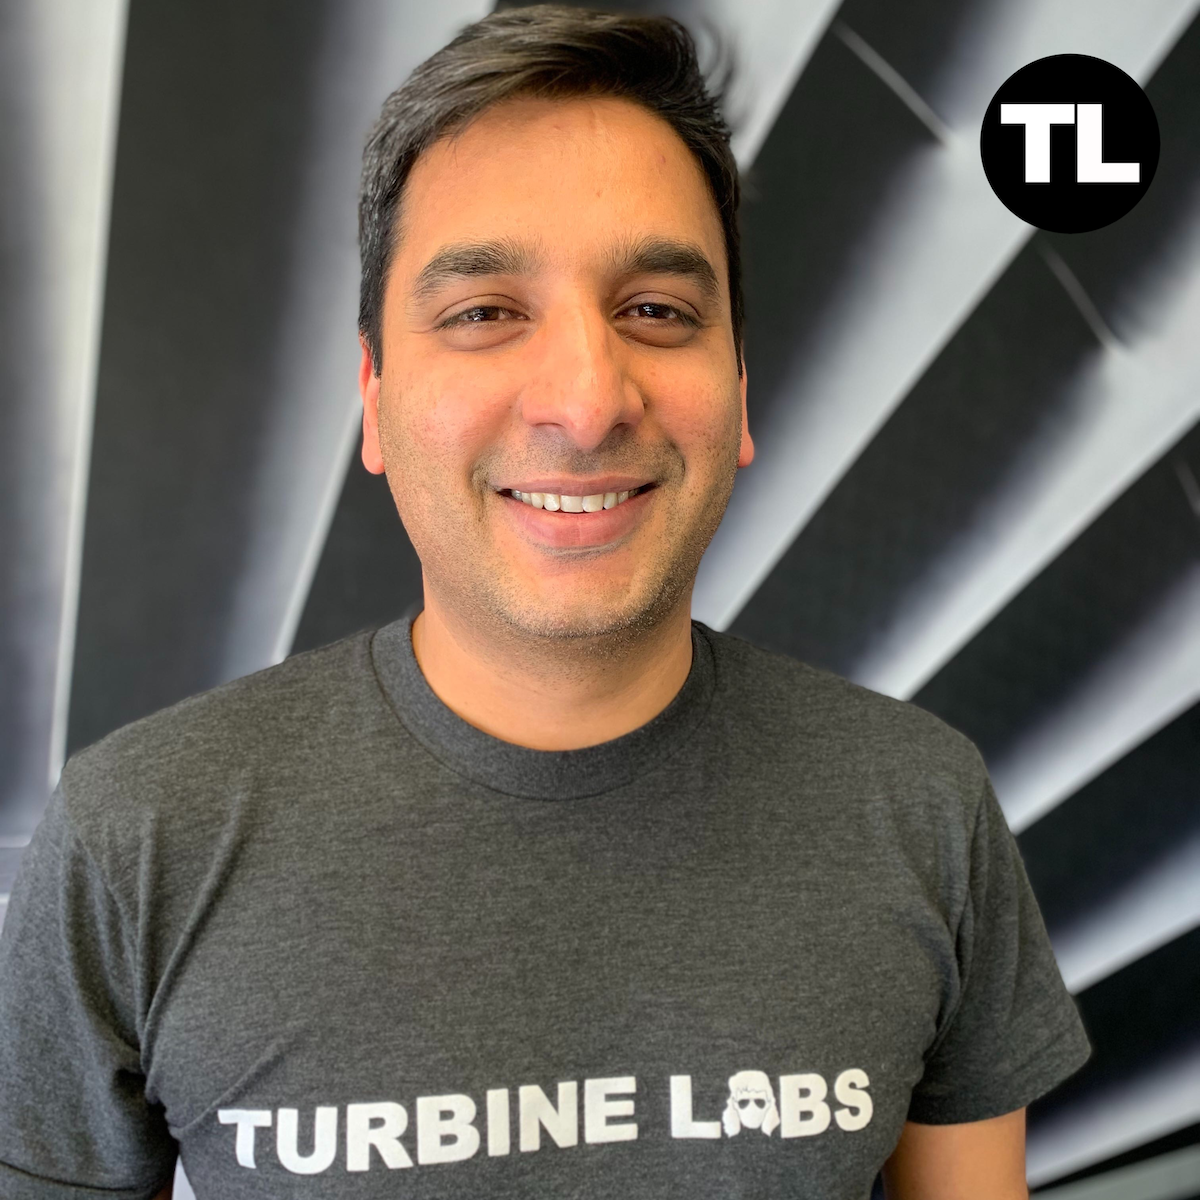 Pawan_Lakshmanan_Turbine_Labs